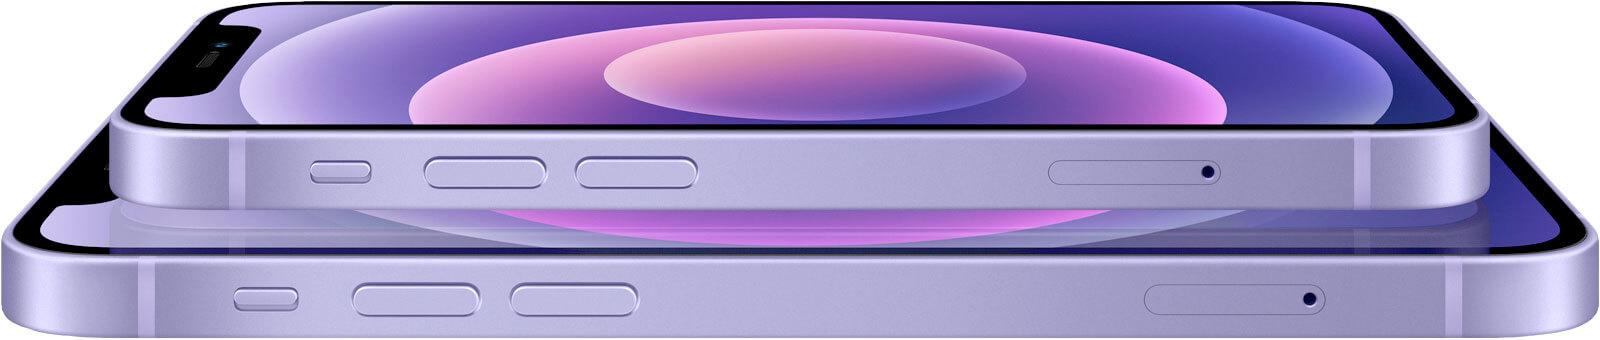 Nuevo iPhone 12 Púrpura Barato